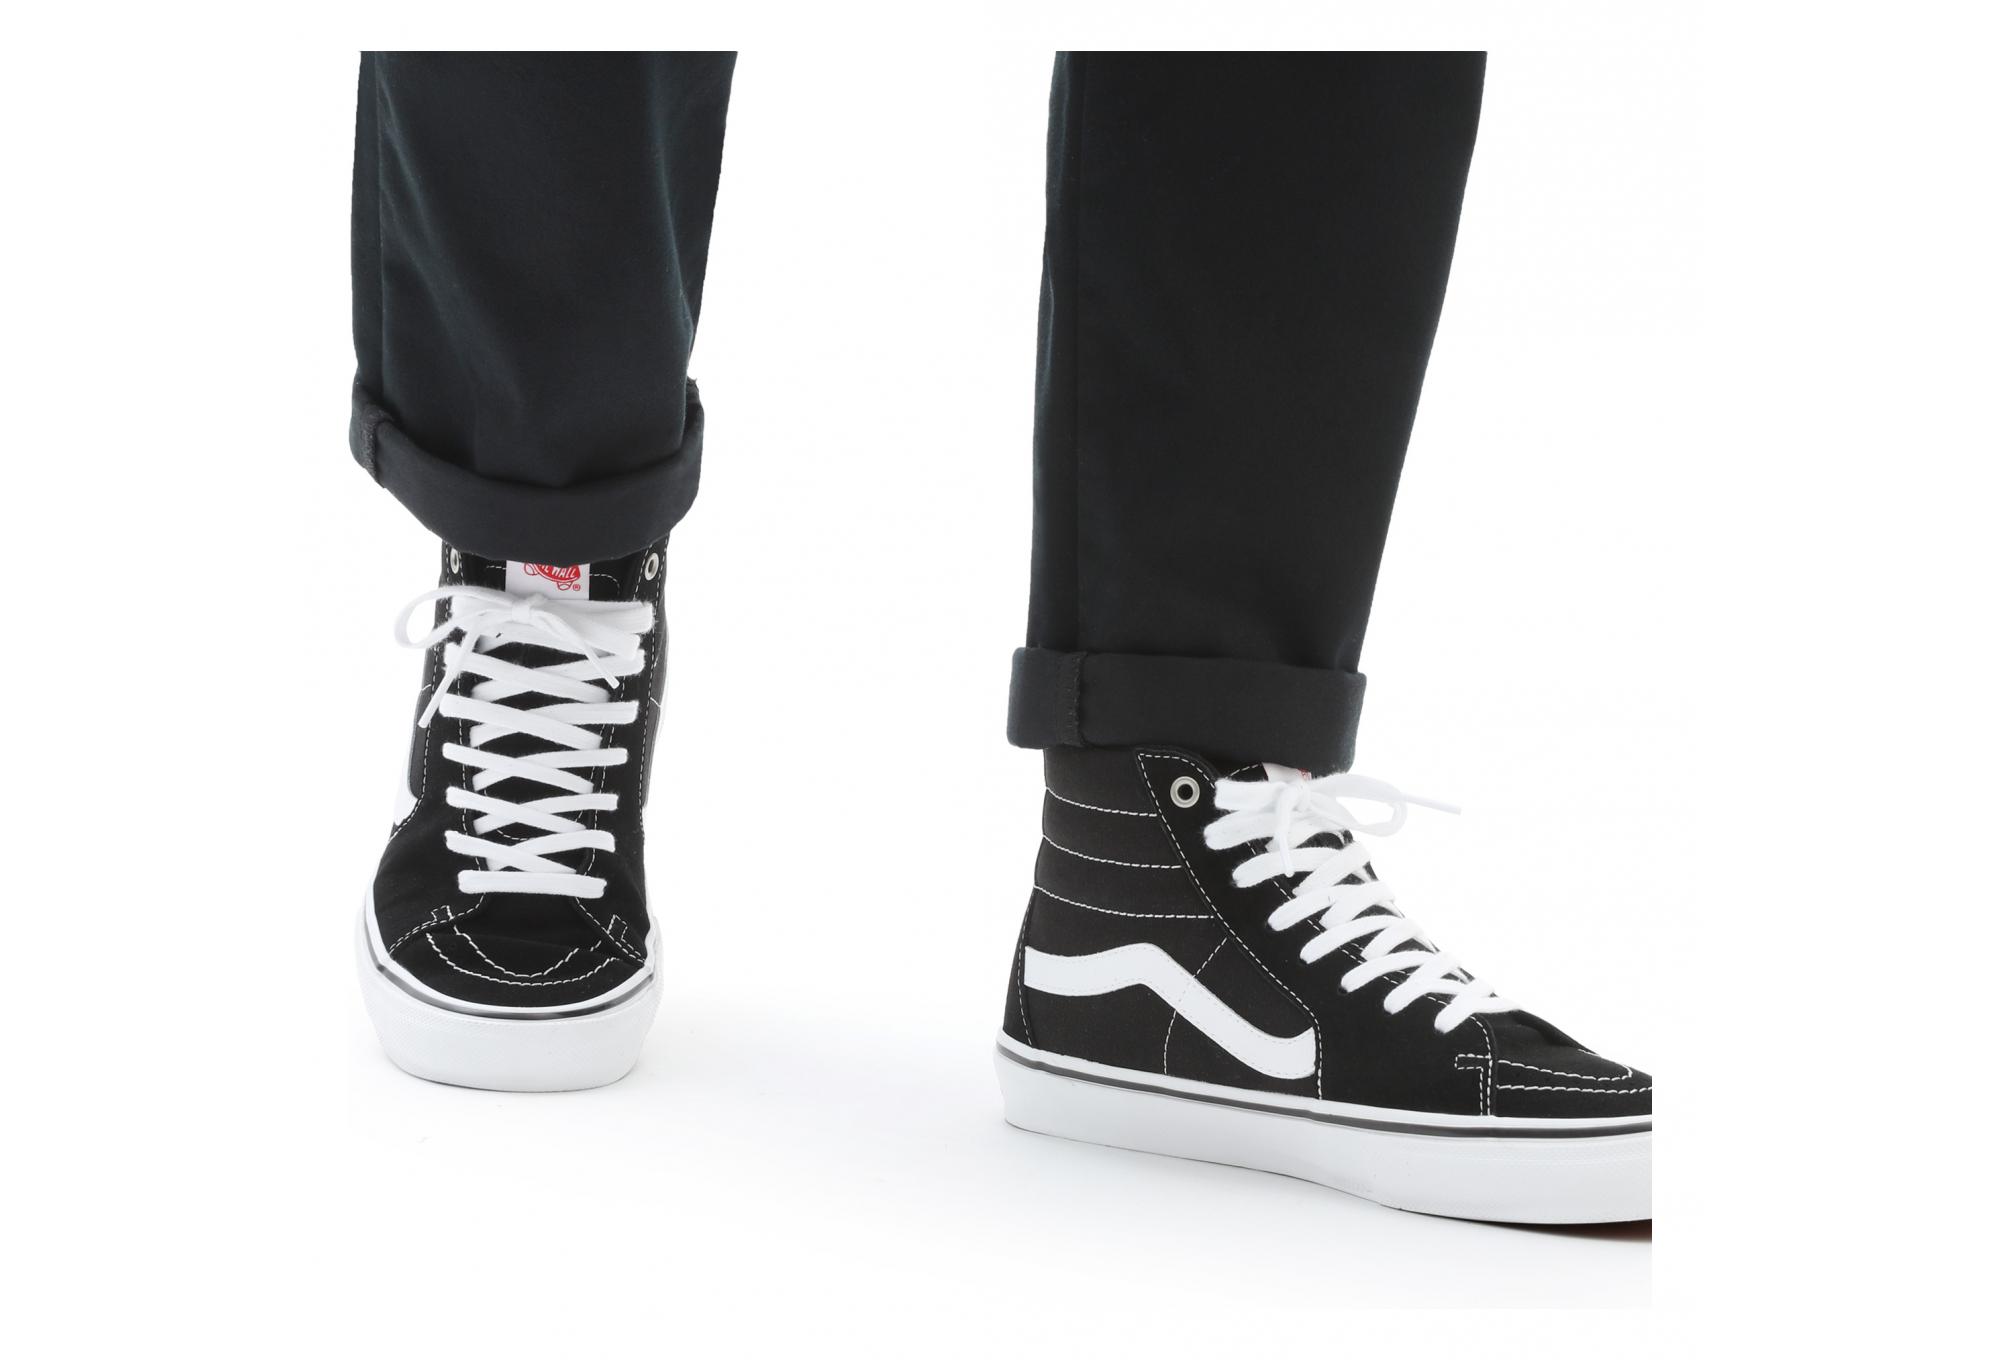 Scarpe da skate Vans SK8-Hi Nere / Bianche